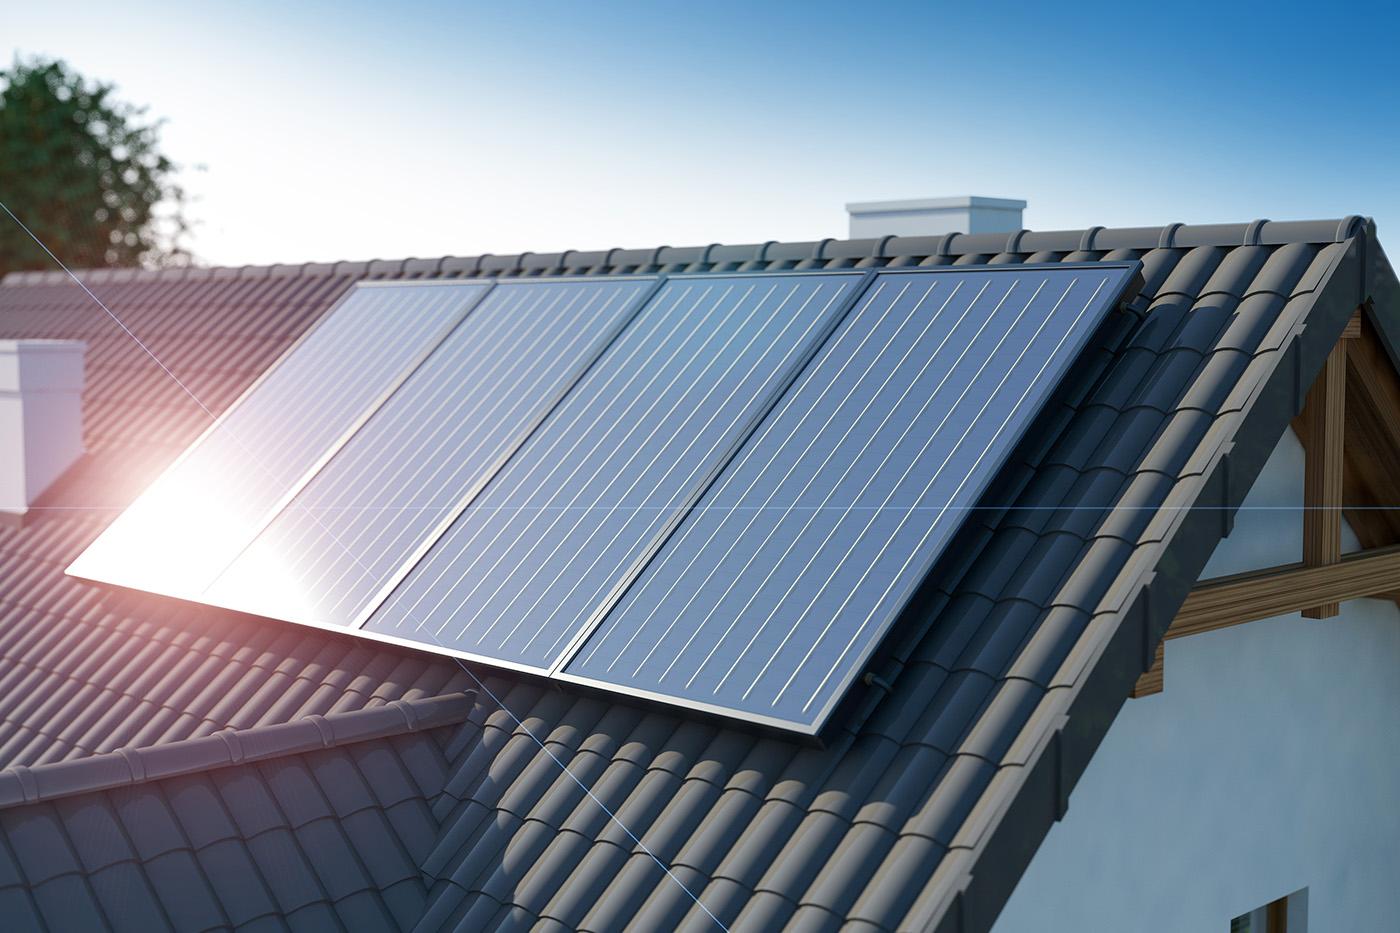 KR-Solar-Panels-Energy-5-Gallery